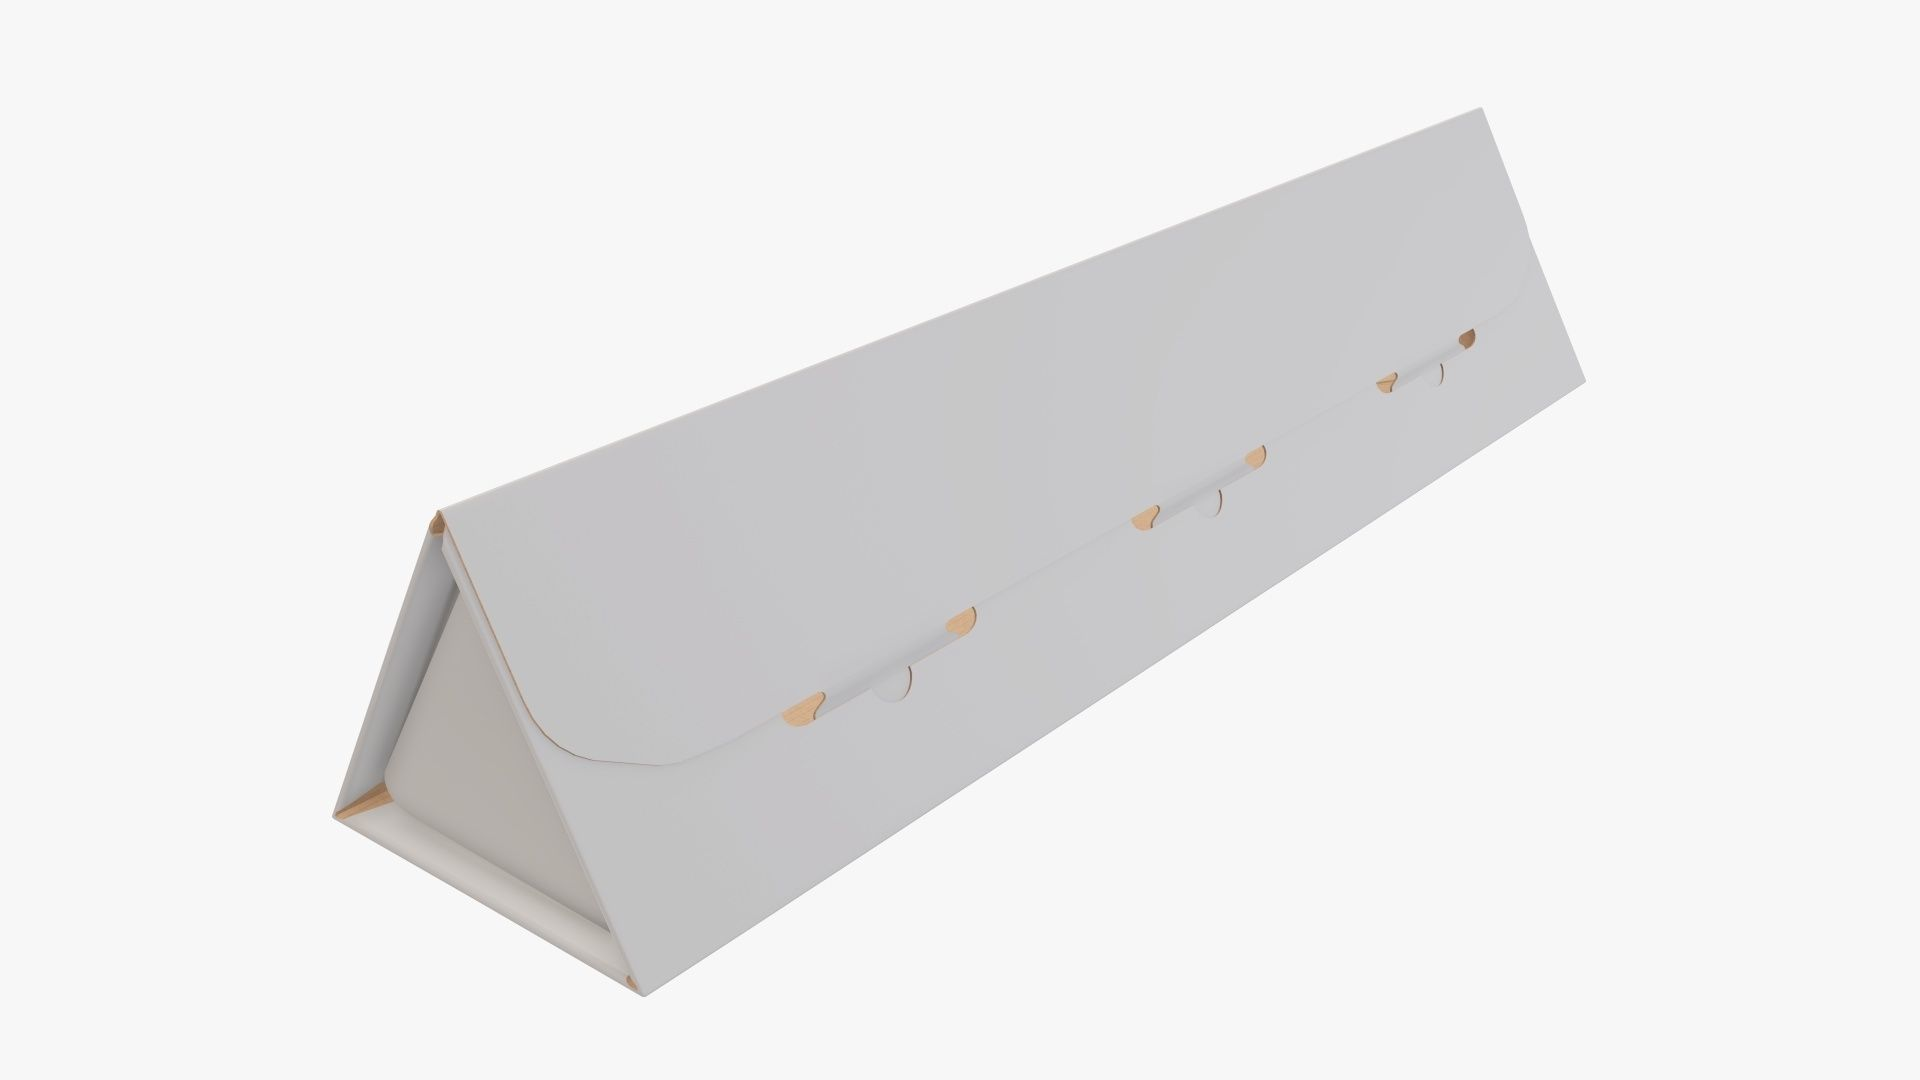 Cardboard tube box triangular